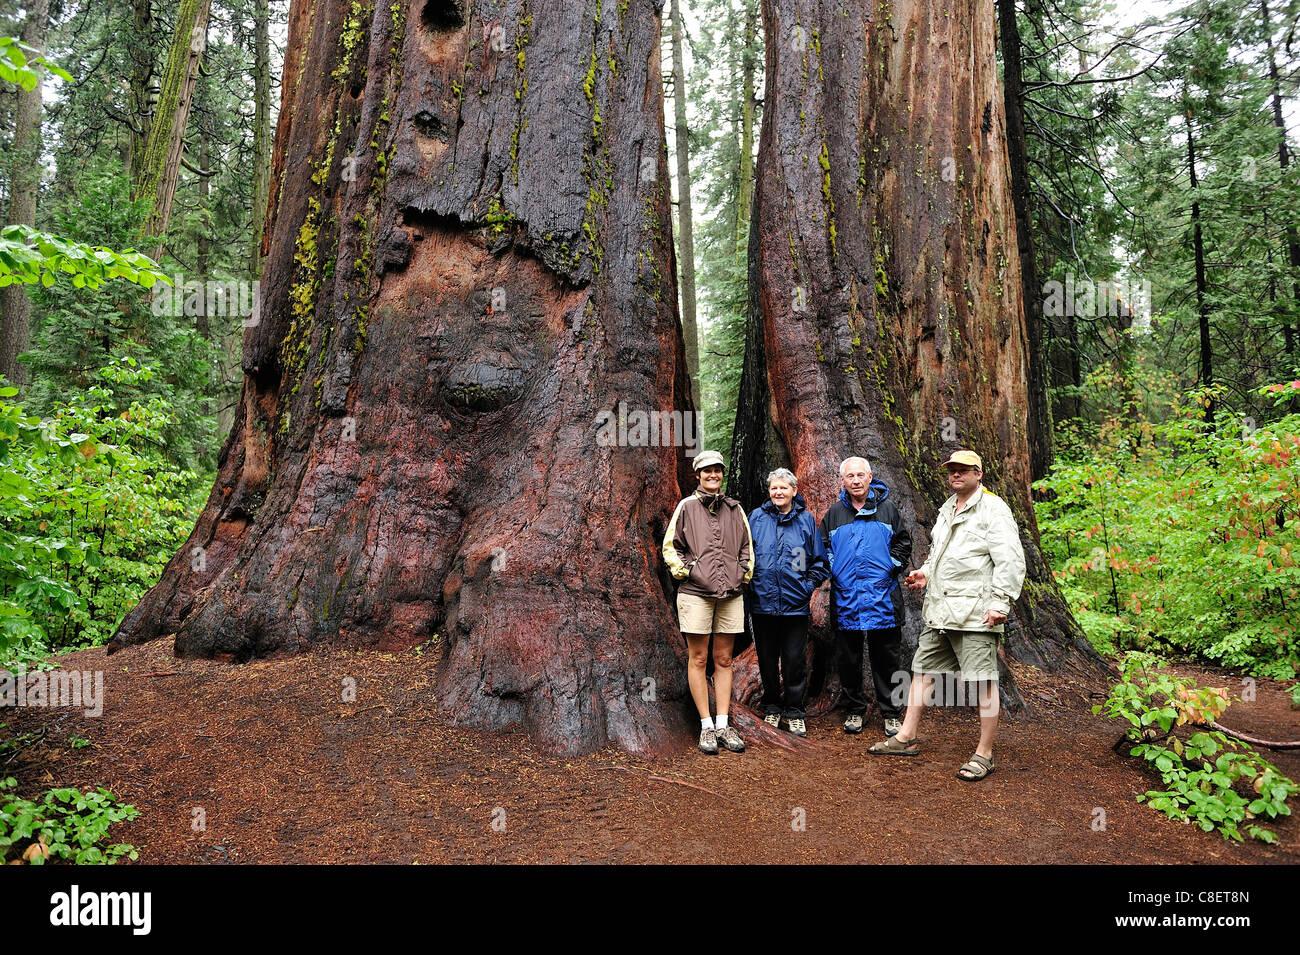 Family, North Grove Trail, Calaveras Big Tree, State Park, California, USA, United States, America, trees, wood, - Stock Image